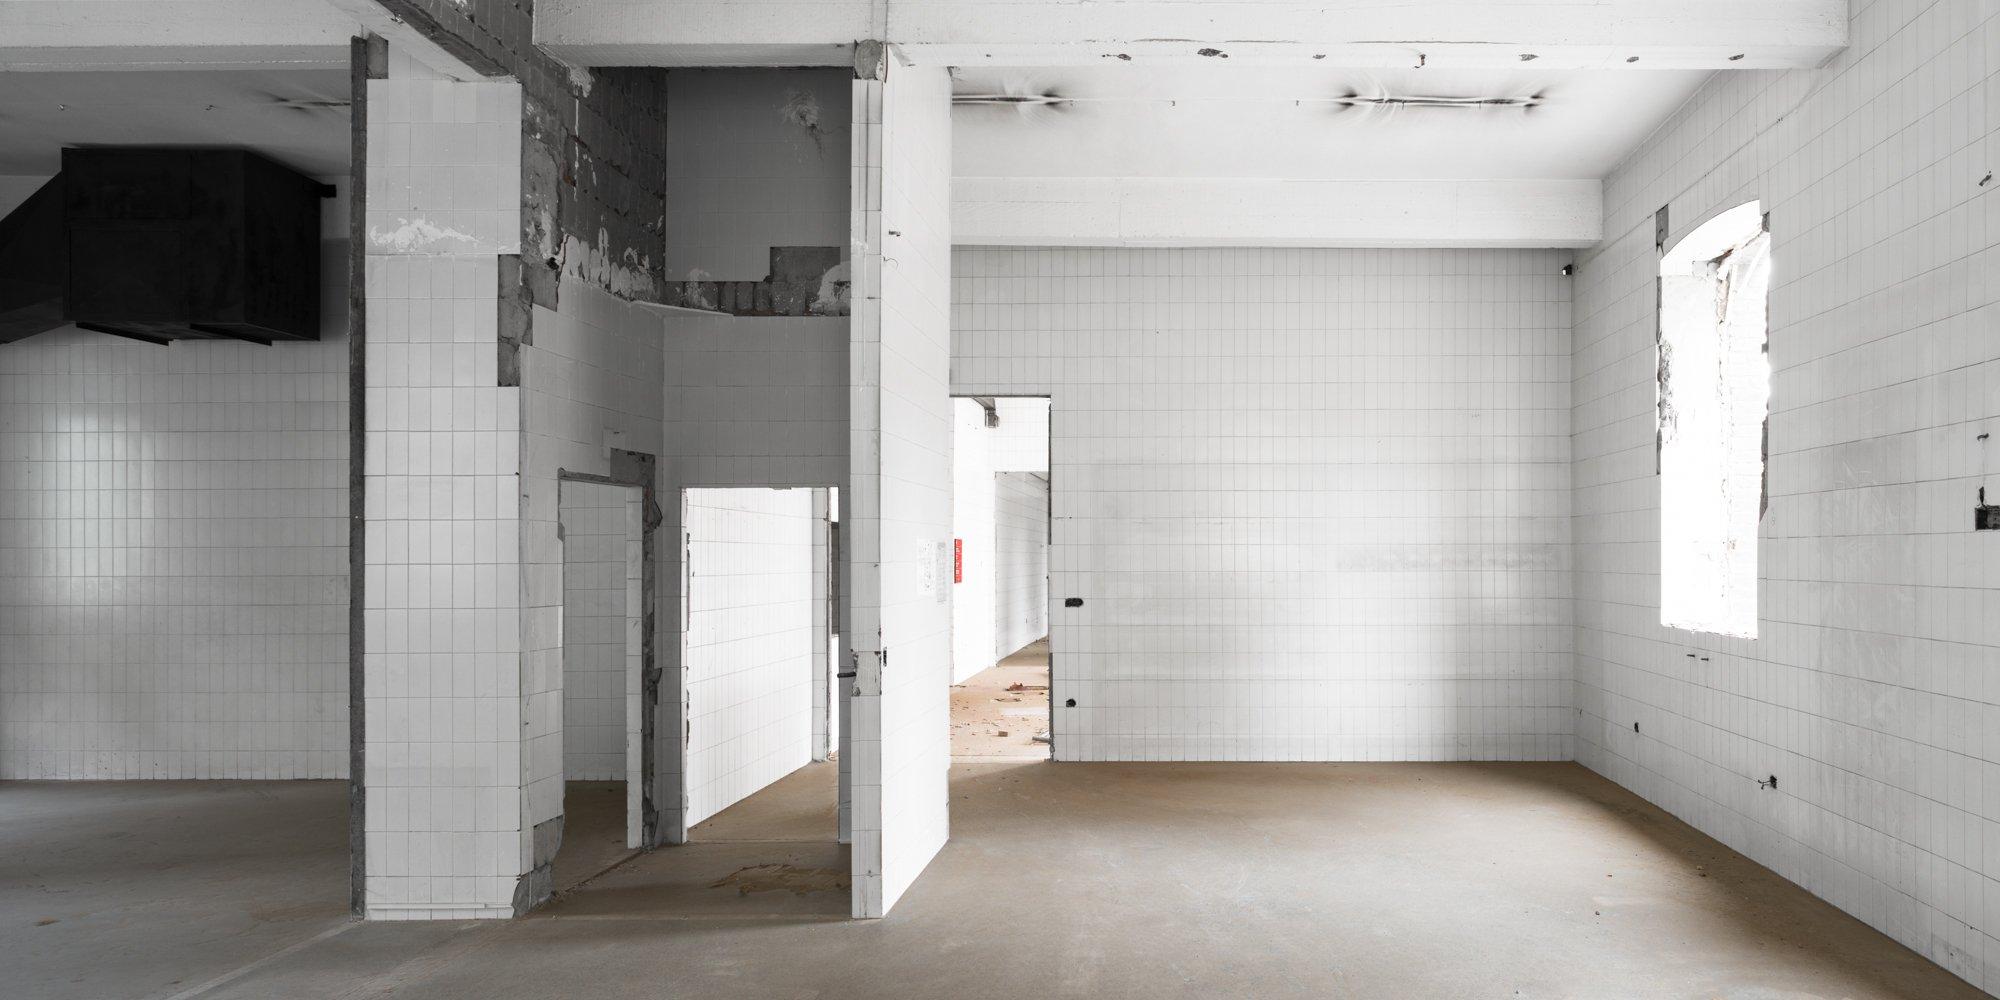 dust down - EMPTINESS - cesar azcarate fotografia, galerias, emptiness